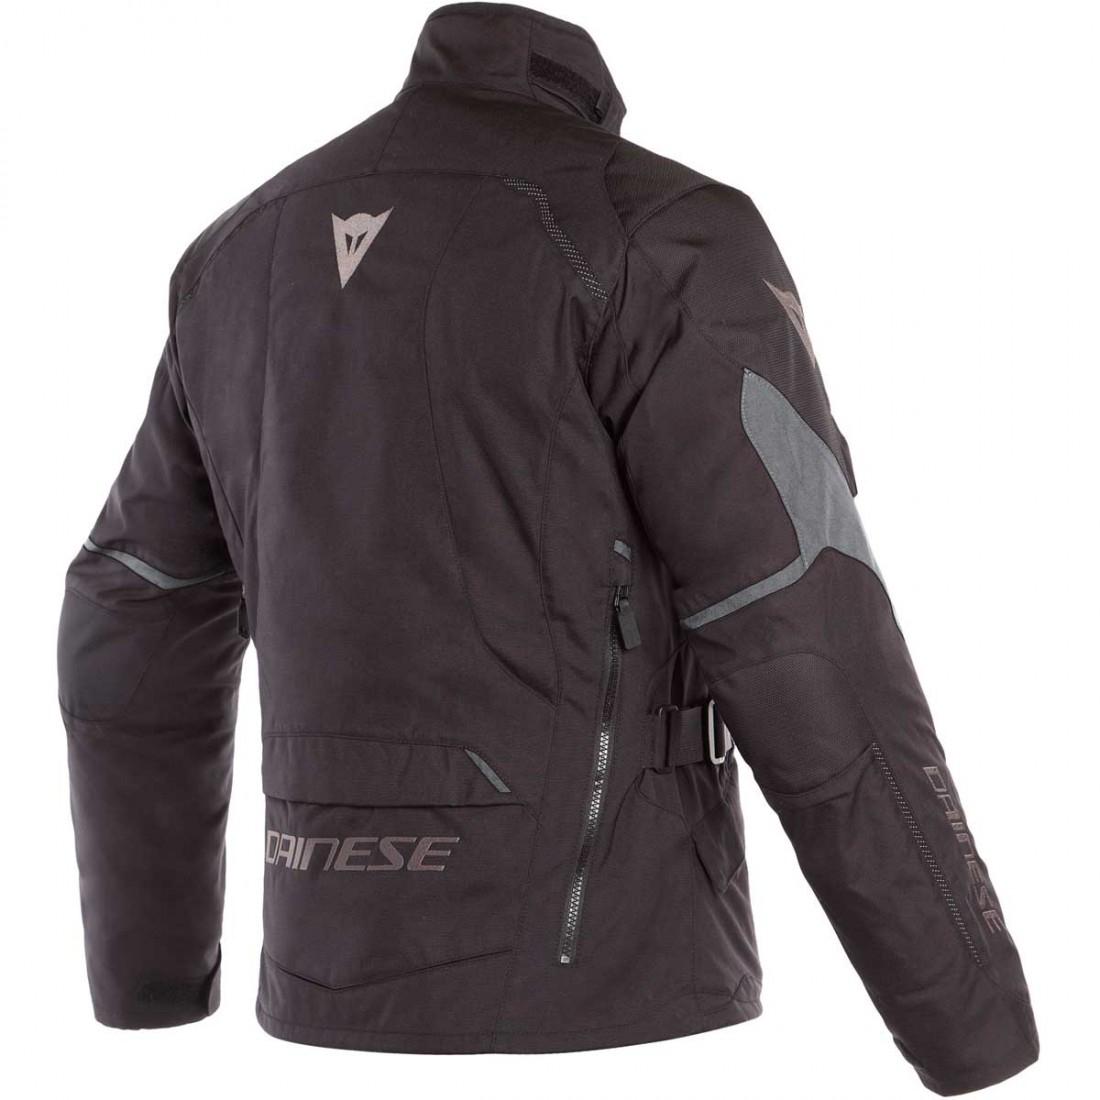 87c02ae11dec6 DAINESE Tempest 2 D-Dry Black / Ebony Jacket · Motocard